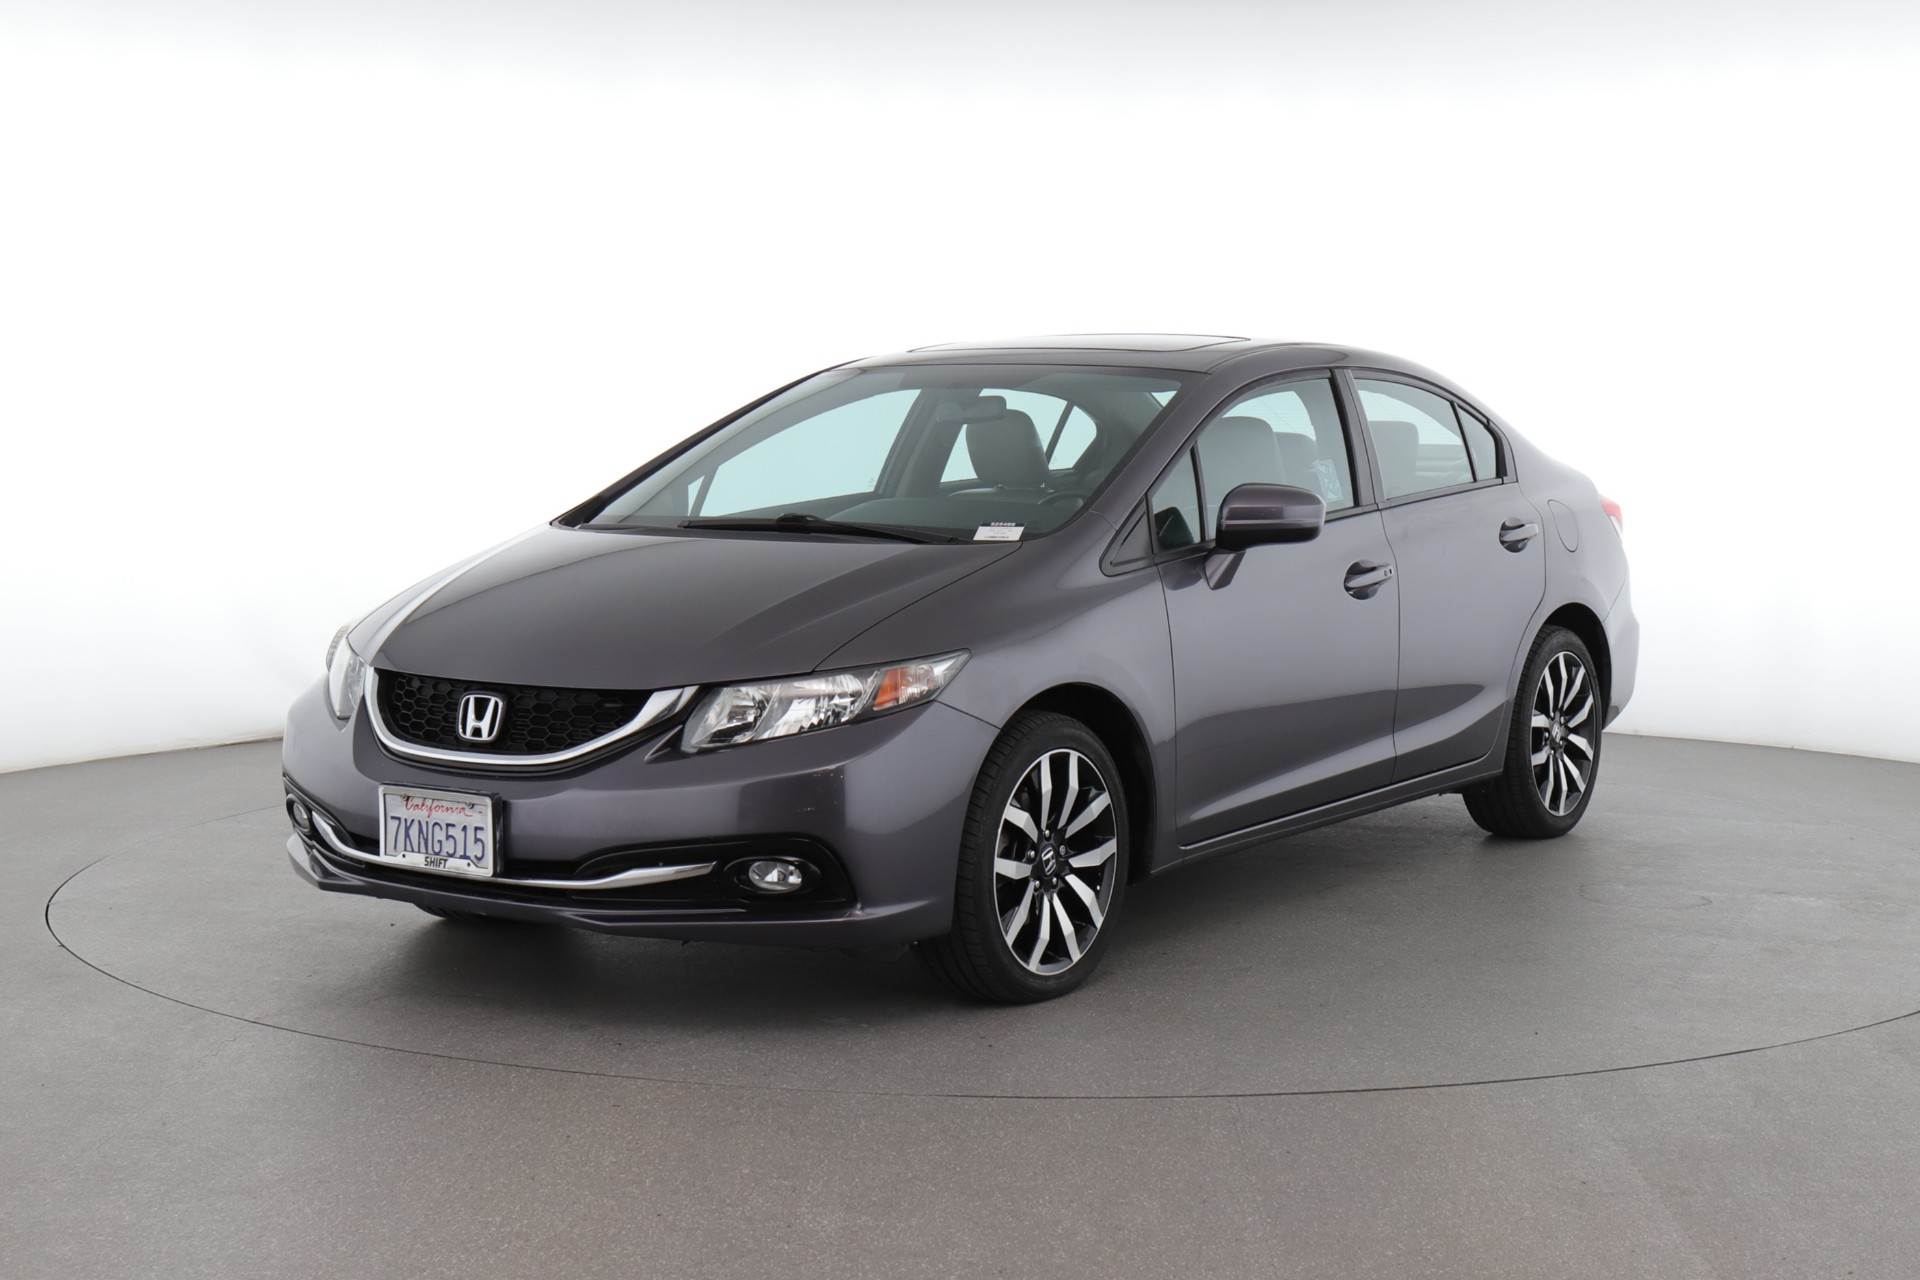 2015 Honda Civic EX-L (from $16,950)